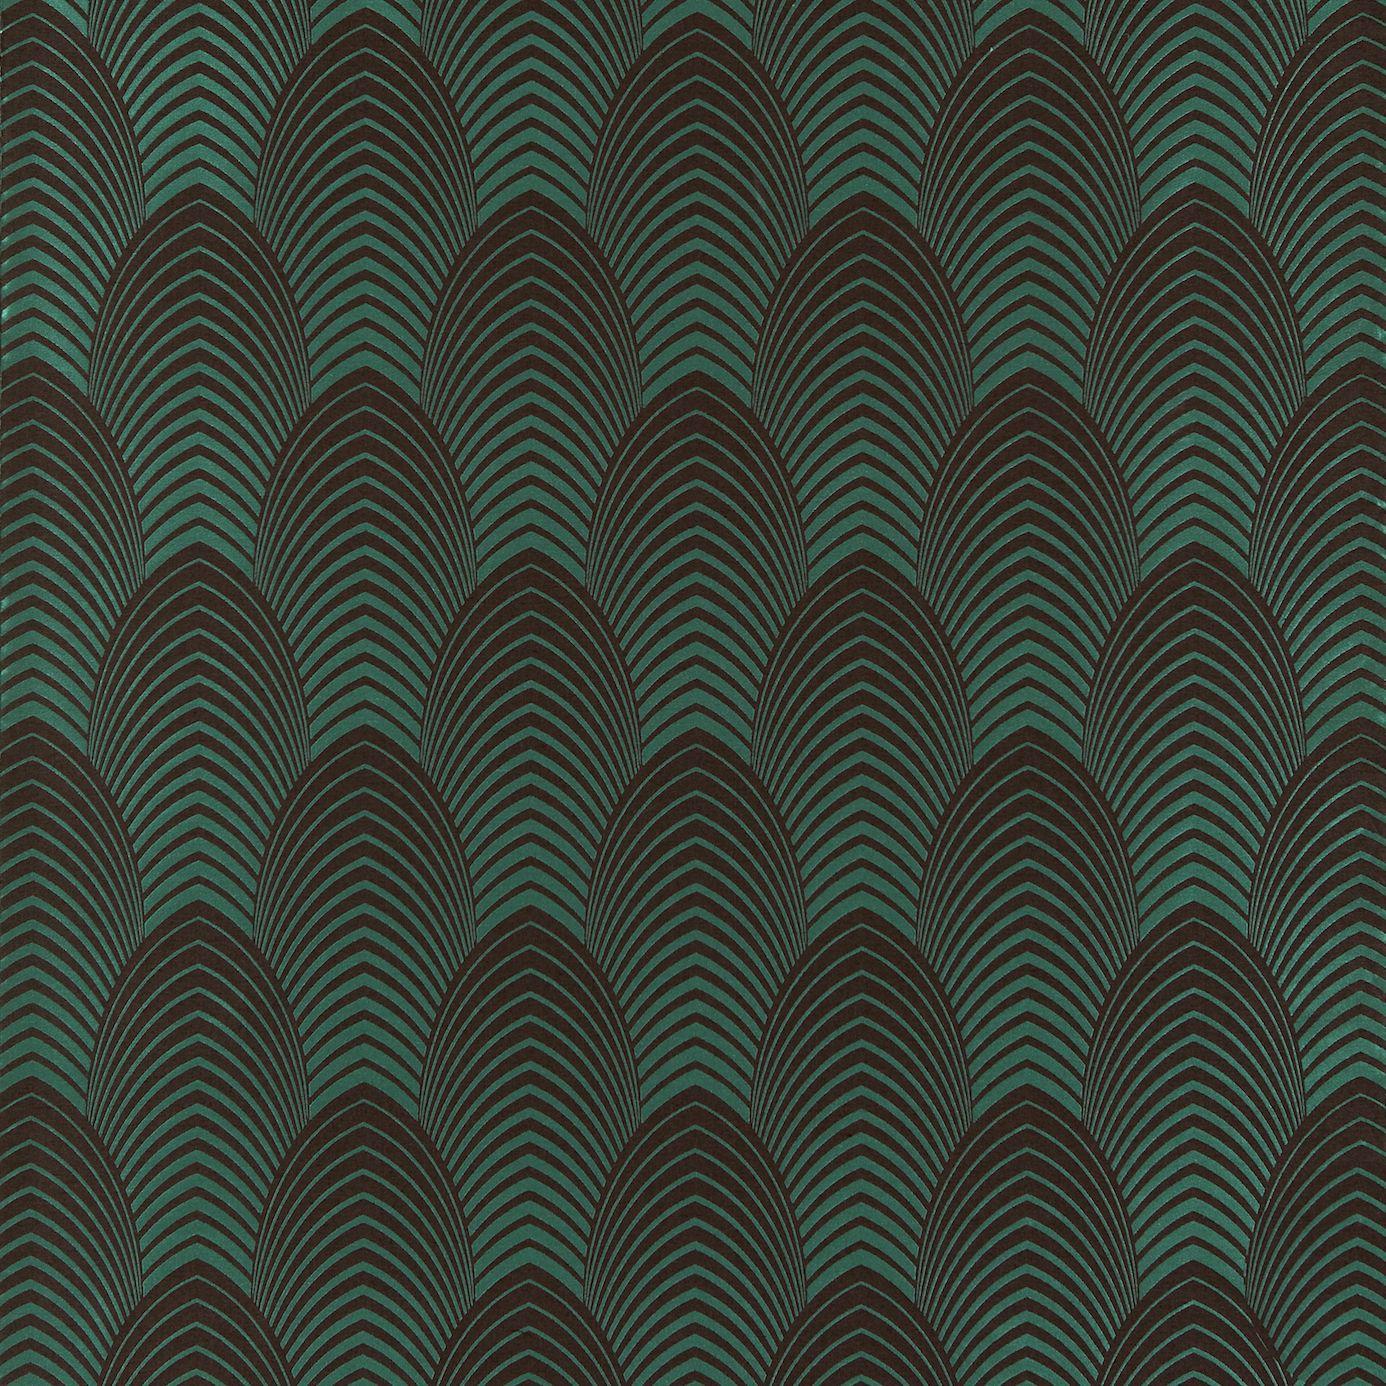 Deco Fabric Arkona Fabric Collection Harlequin Fabric 1386x1386